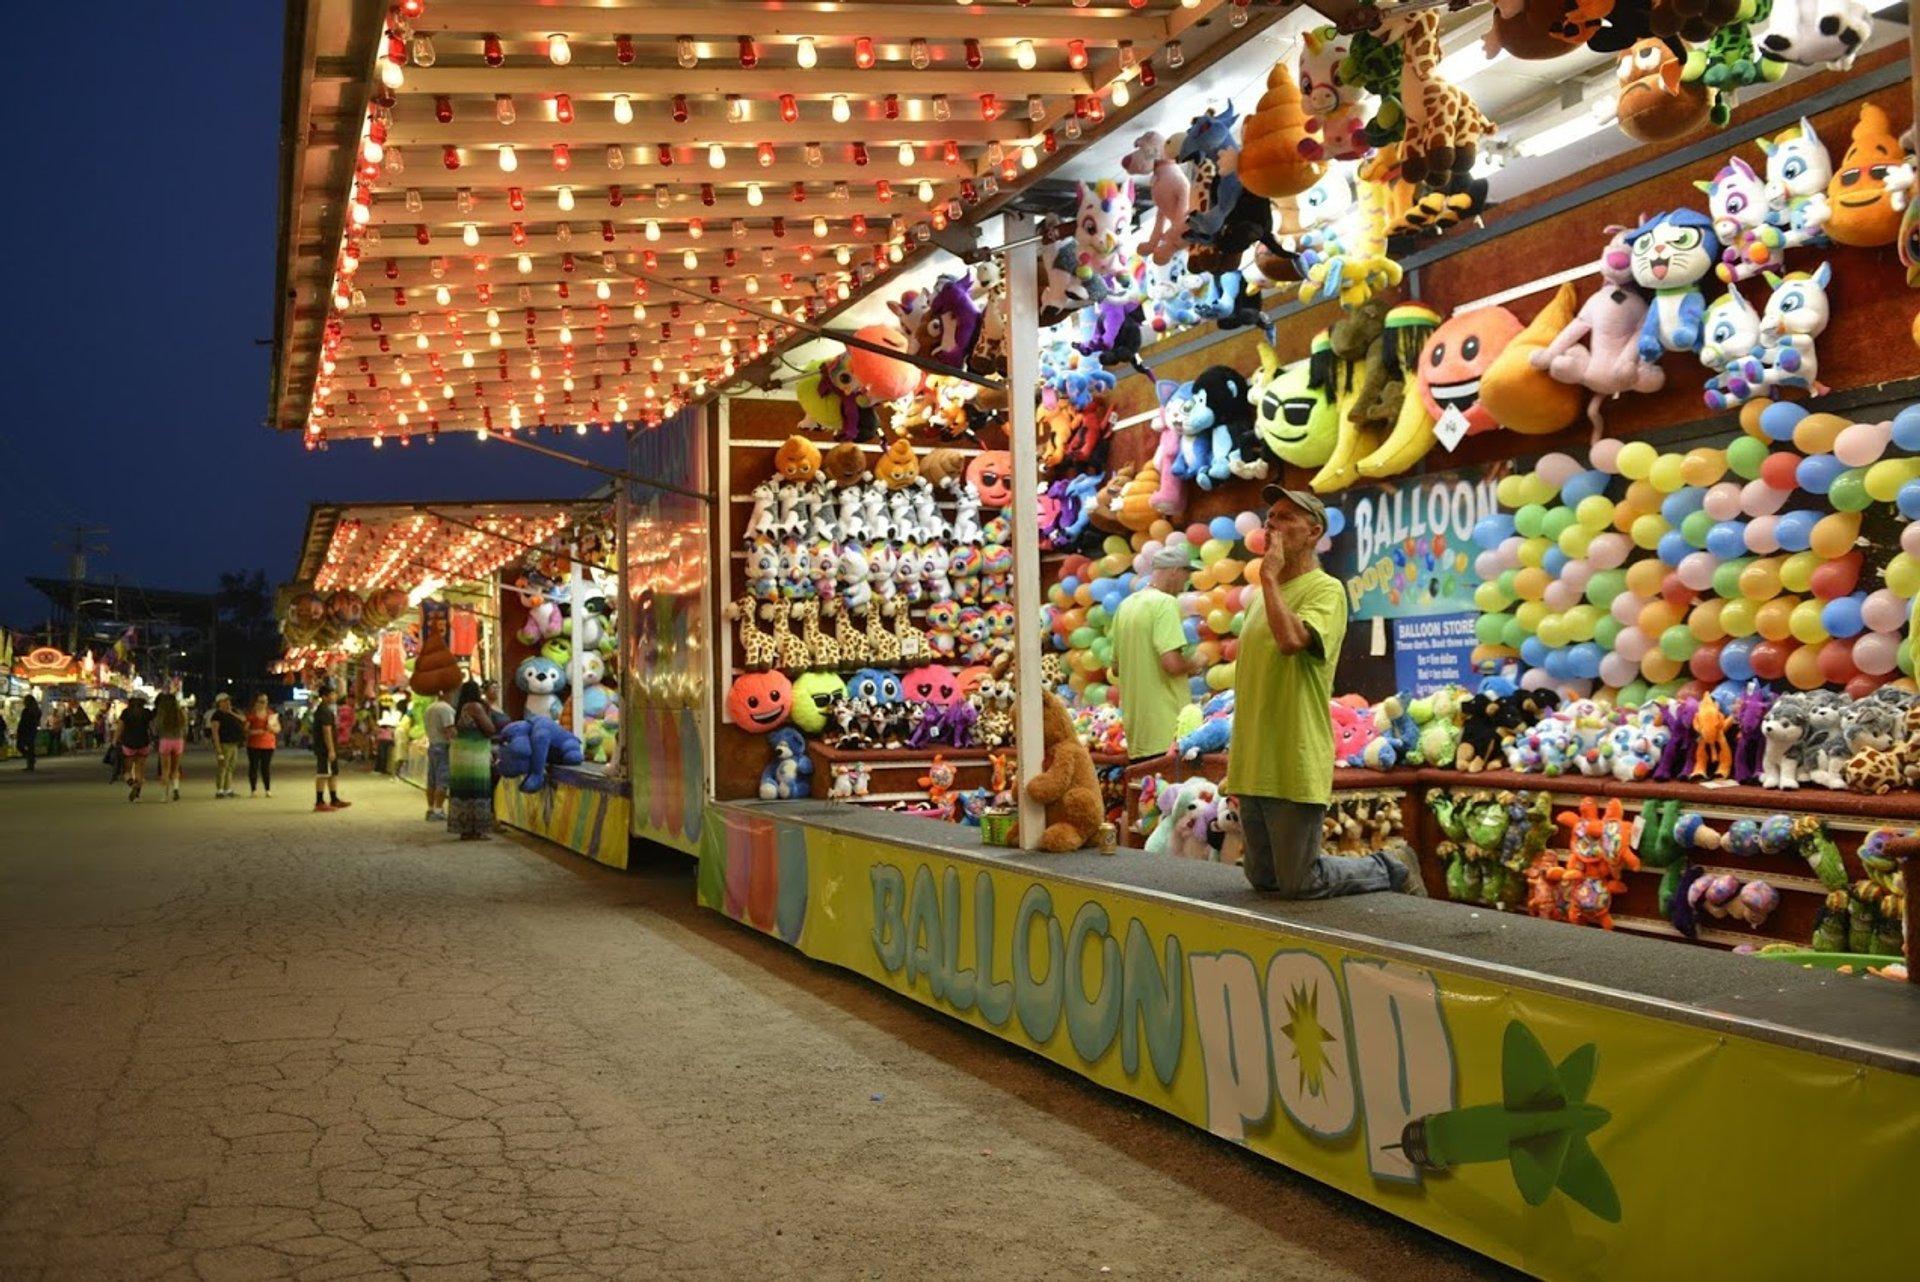 Cuyahoga County Fair in Ohio 2020 - Best Time